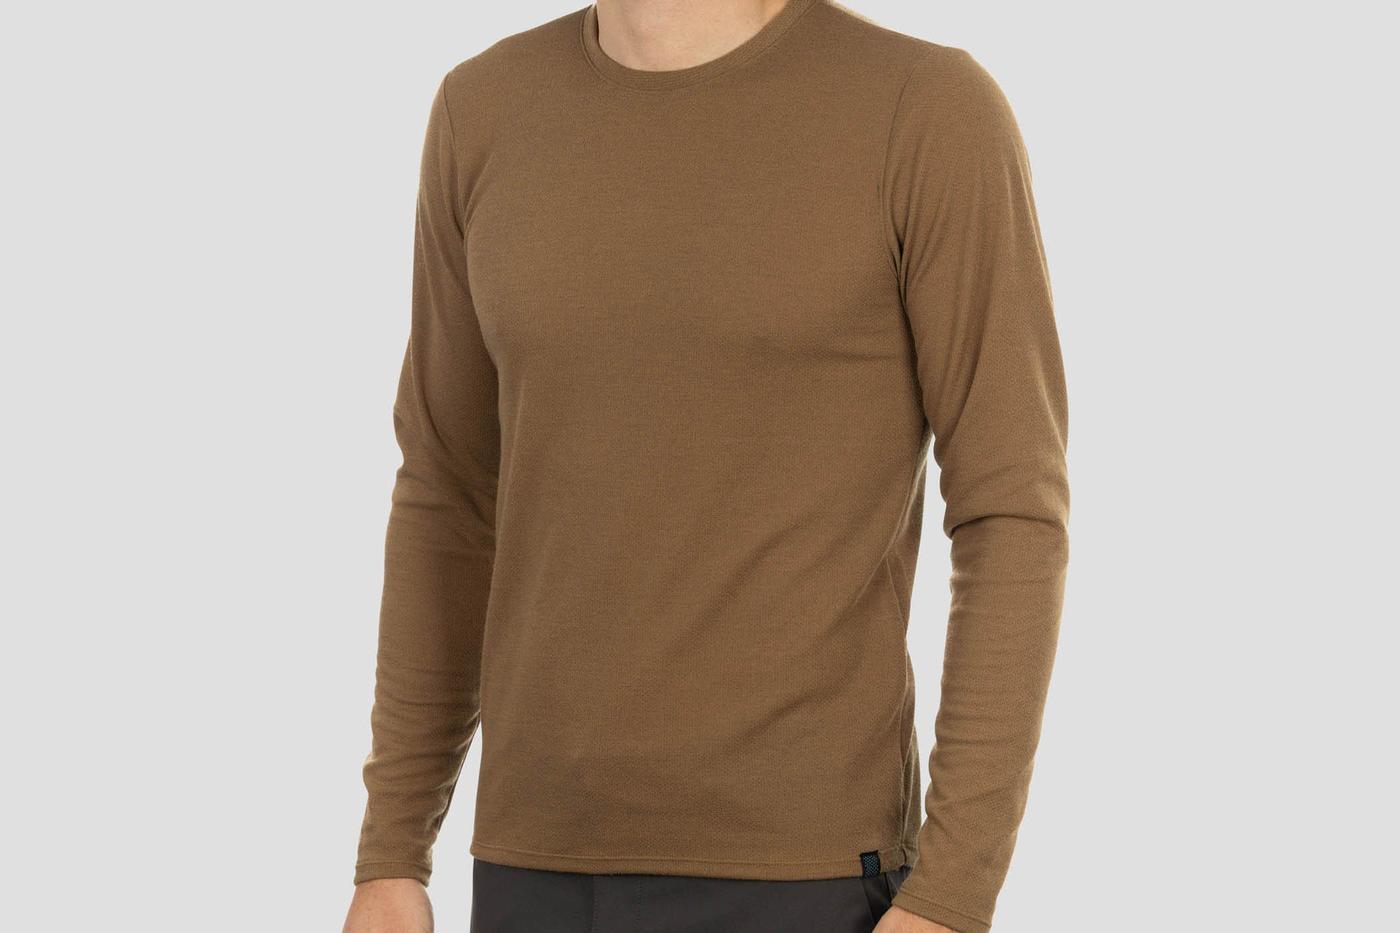 ORNOT's Long Sleeve Trail Shirt